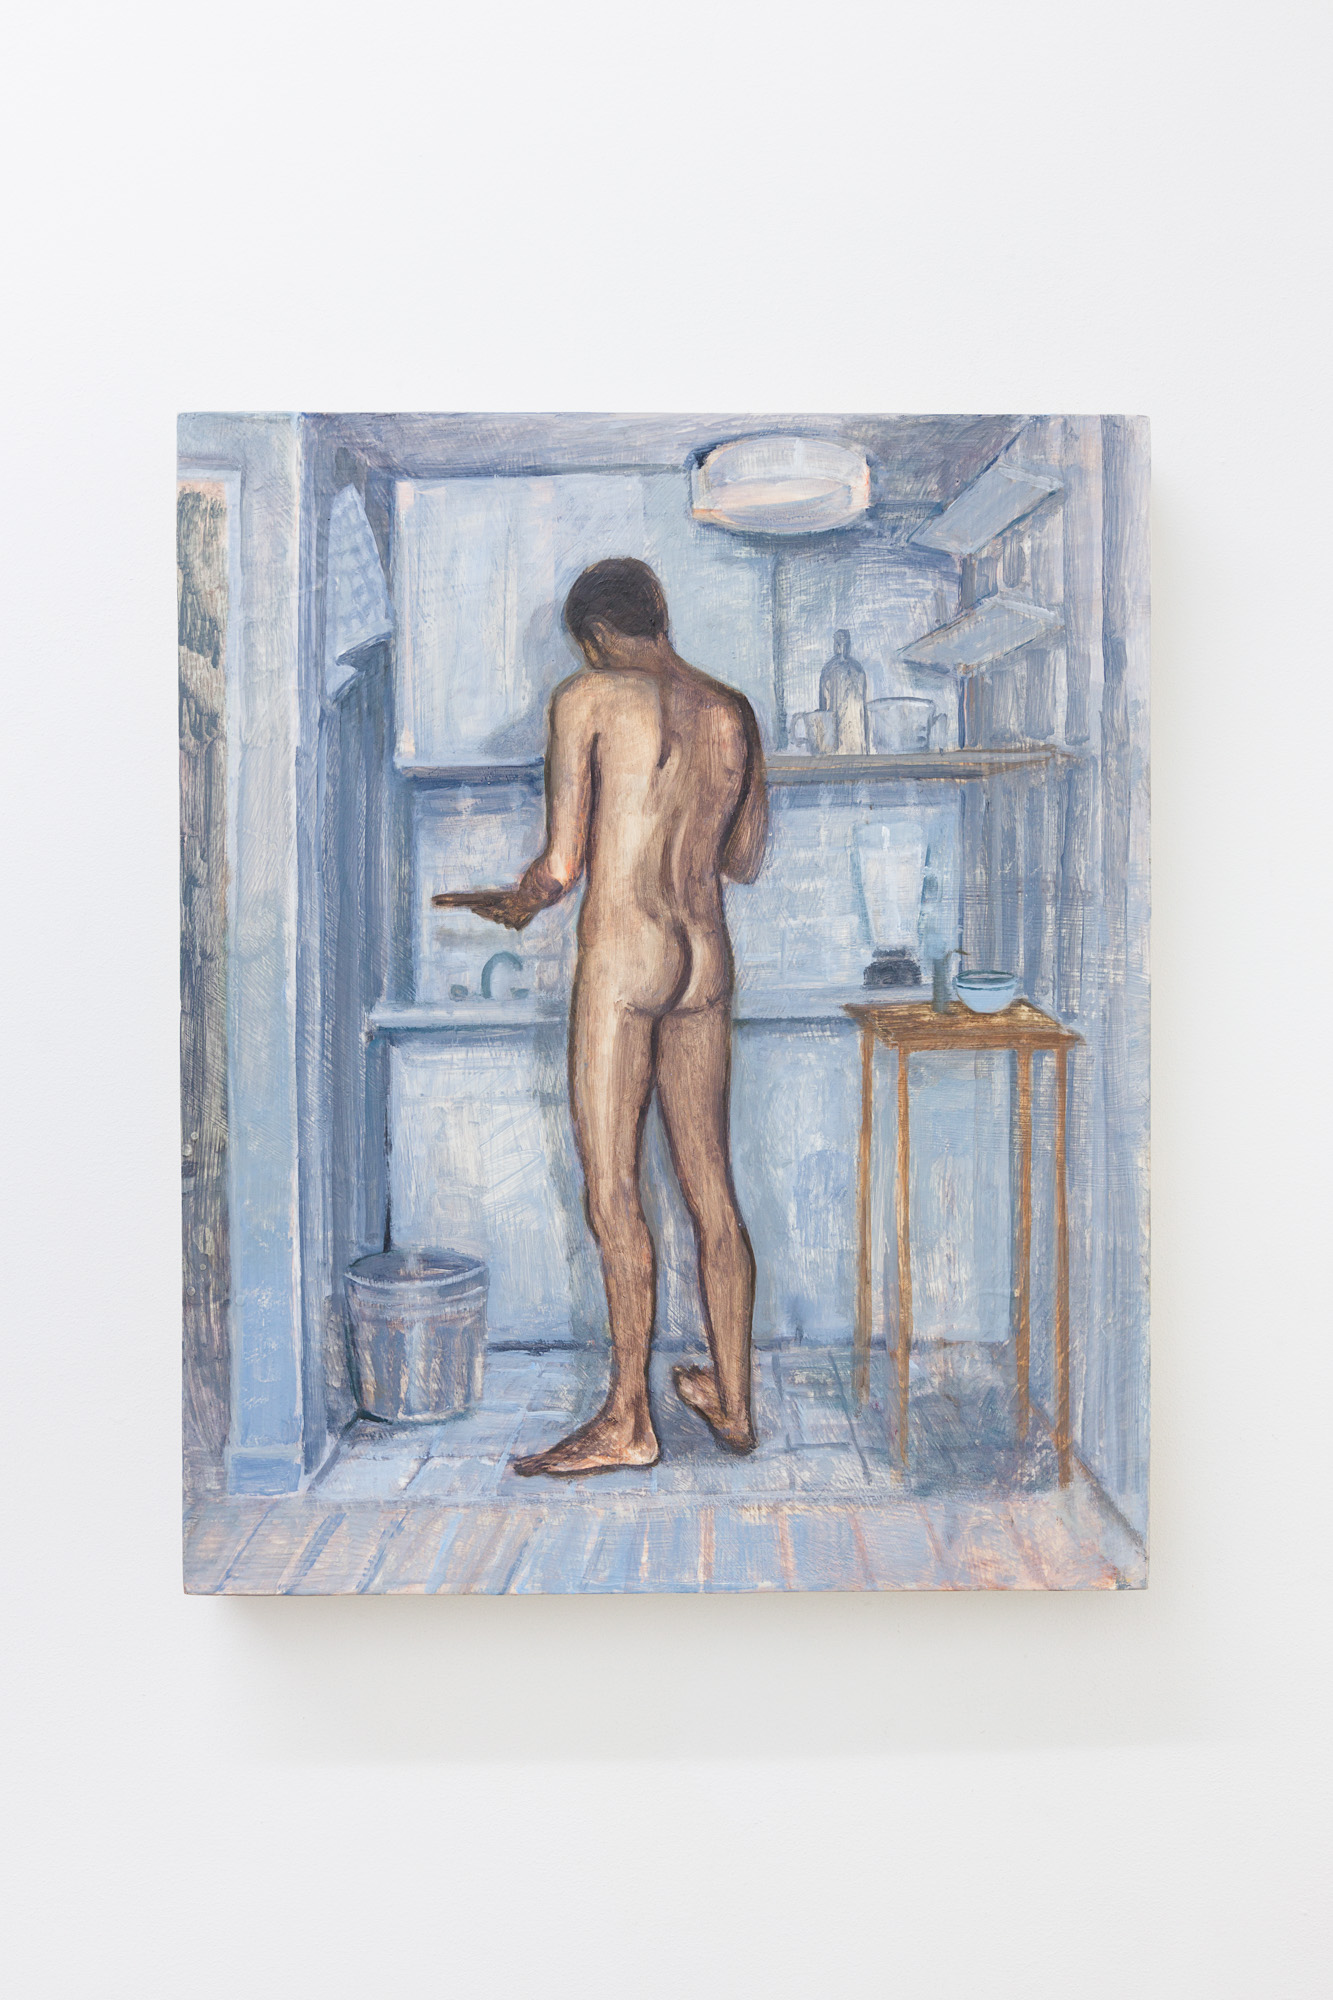 Nathanaëlle Herbelin, Kitchen, 2019, huile sur bois, 46x38cm